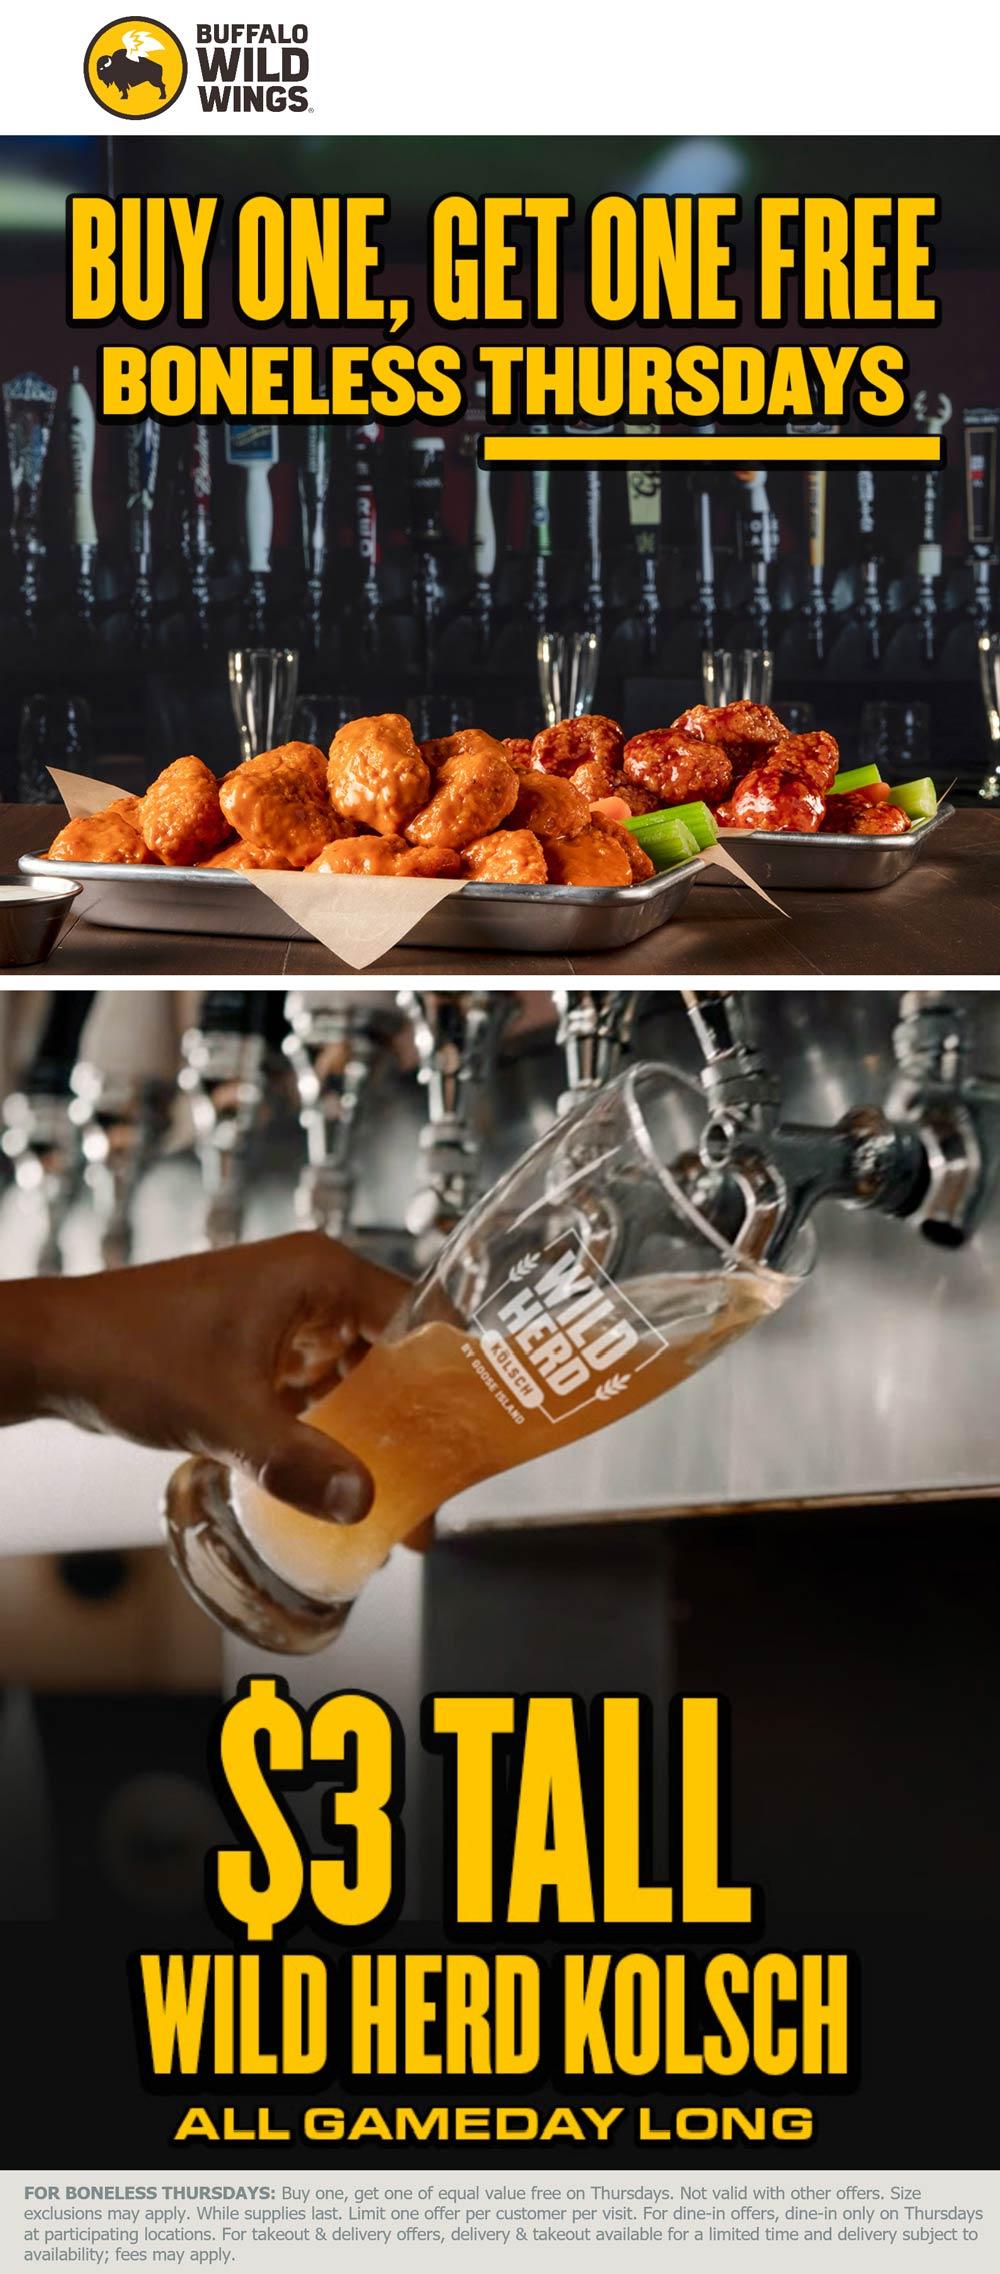 Buffalo Wild Wings restaurants Coupon  2nd boneless chicken wings free today at Buffalo Wild Wings #buffalowildwings